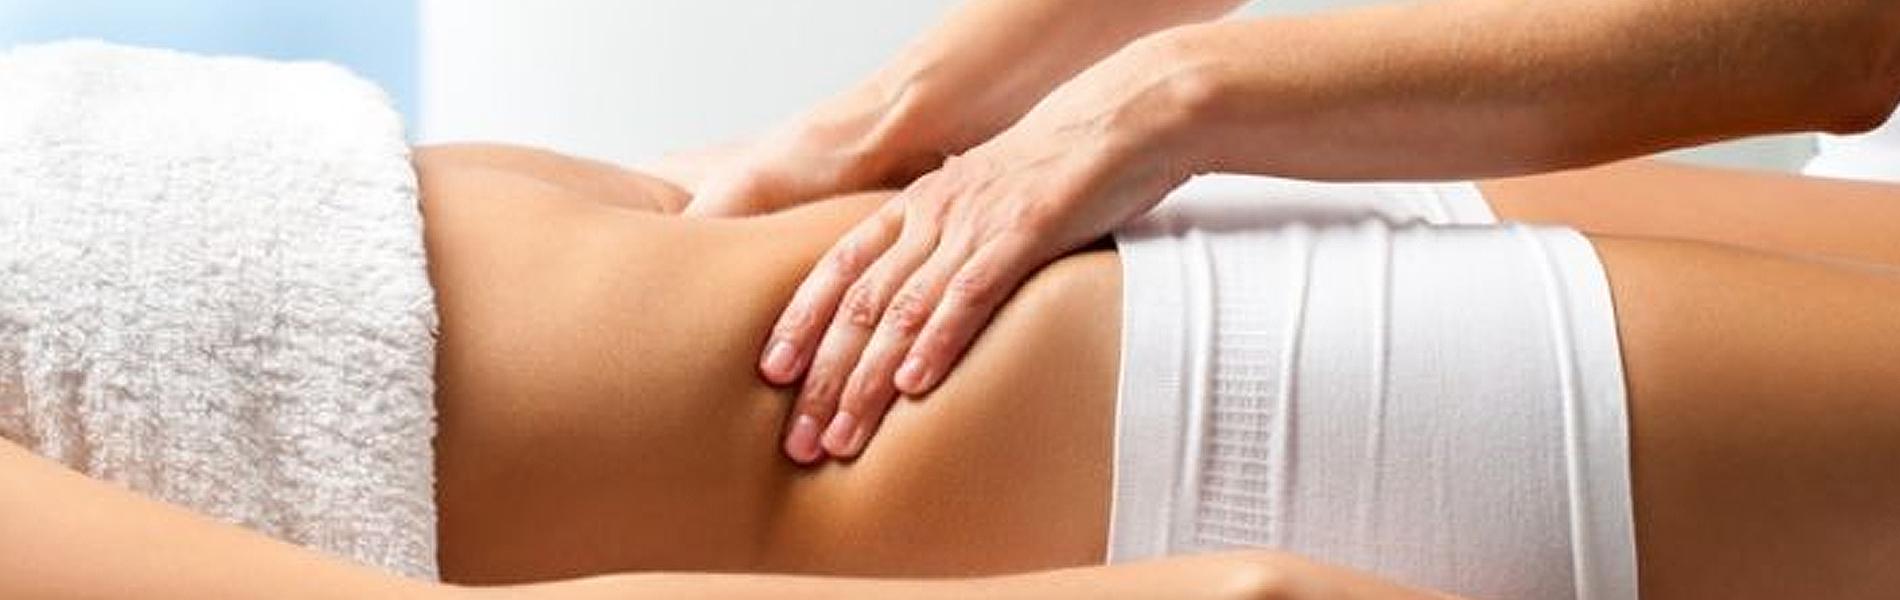 Kurs fizjoterapia uroginekologiczna